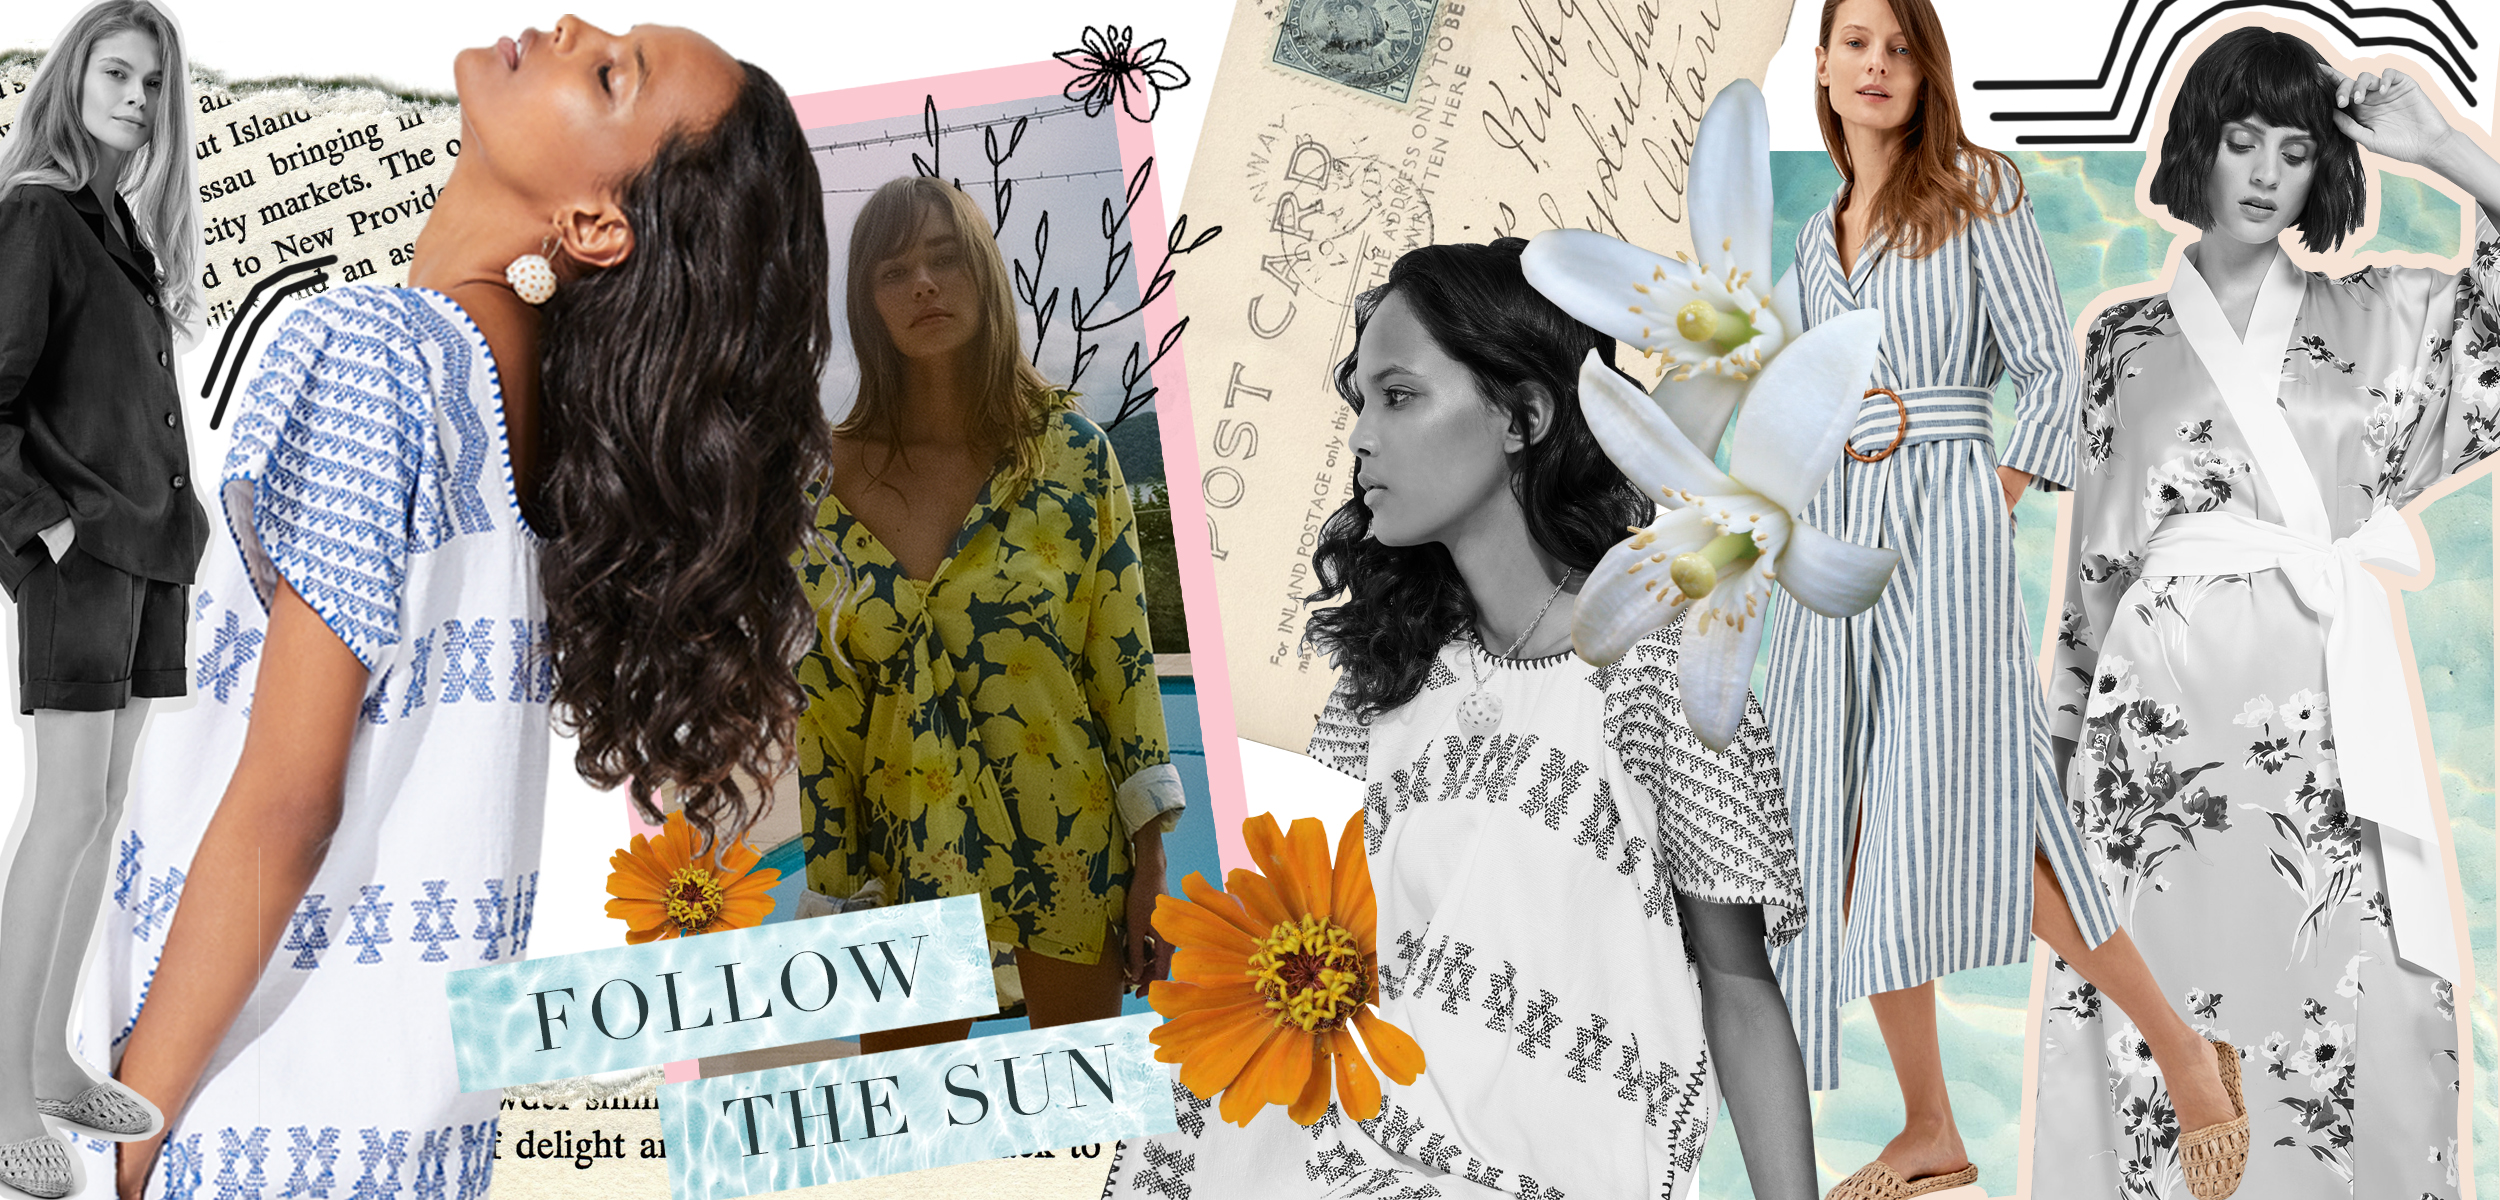 Moda Operandi Cover Ups Summer Series x Katy Edling